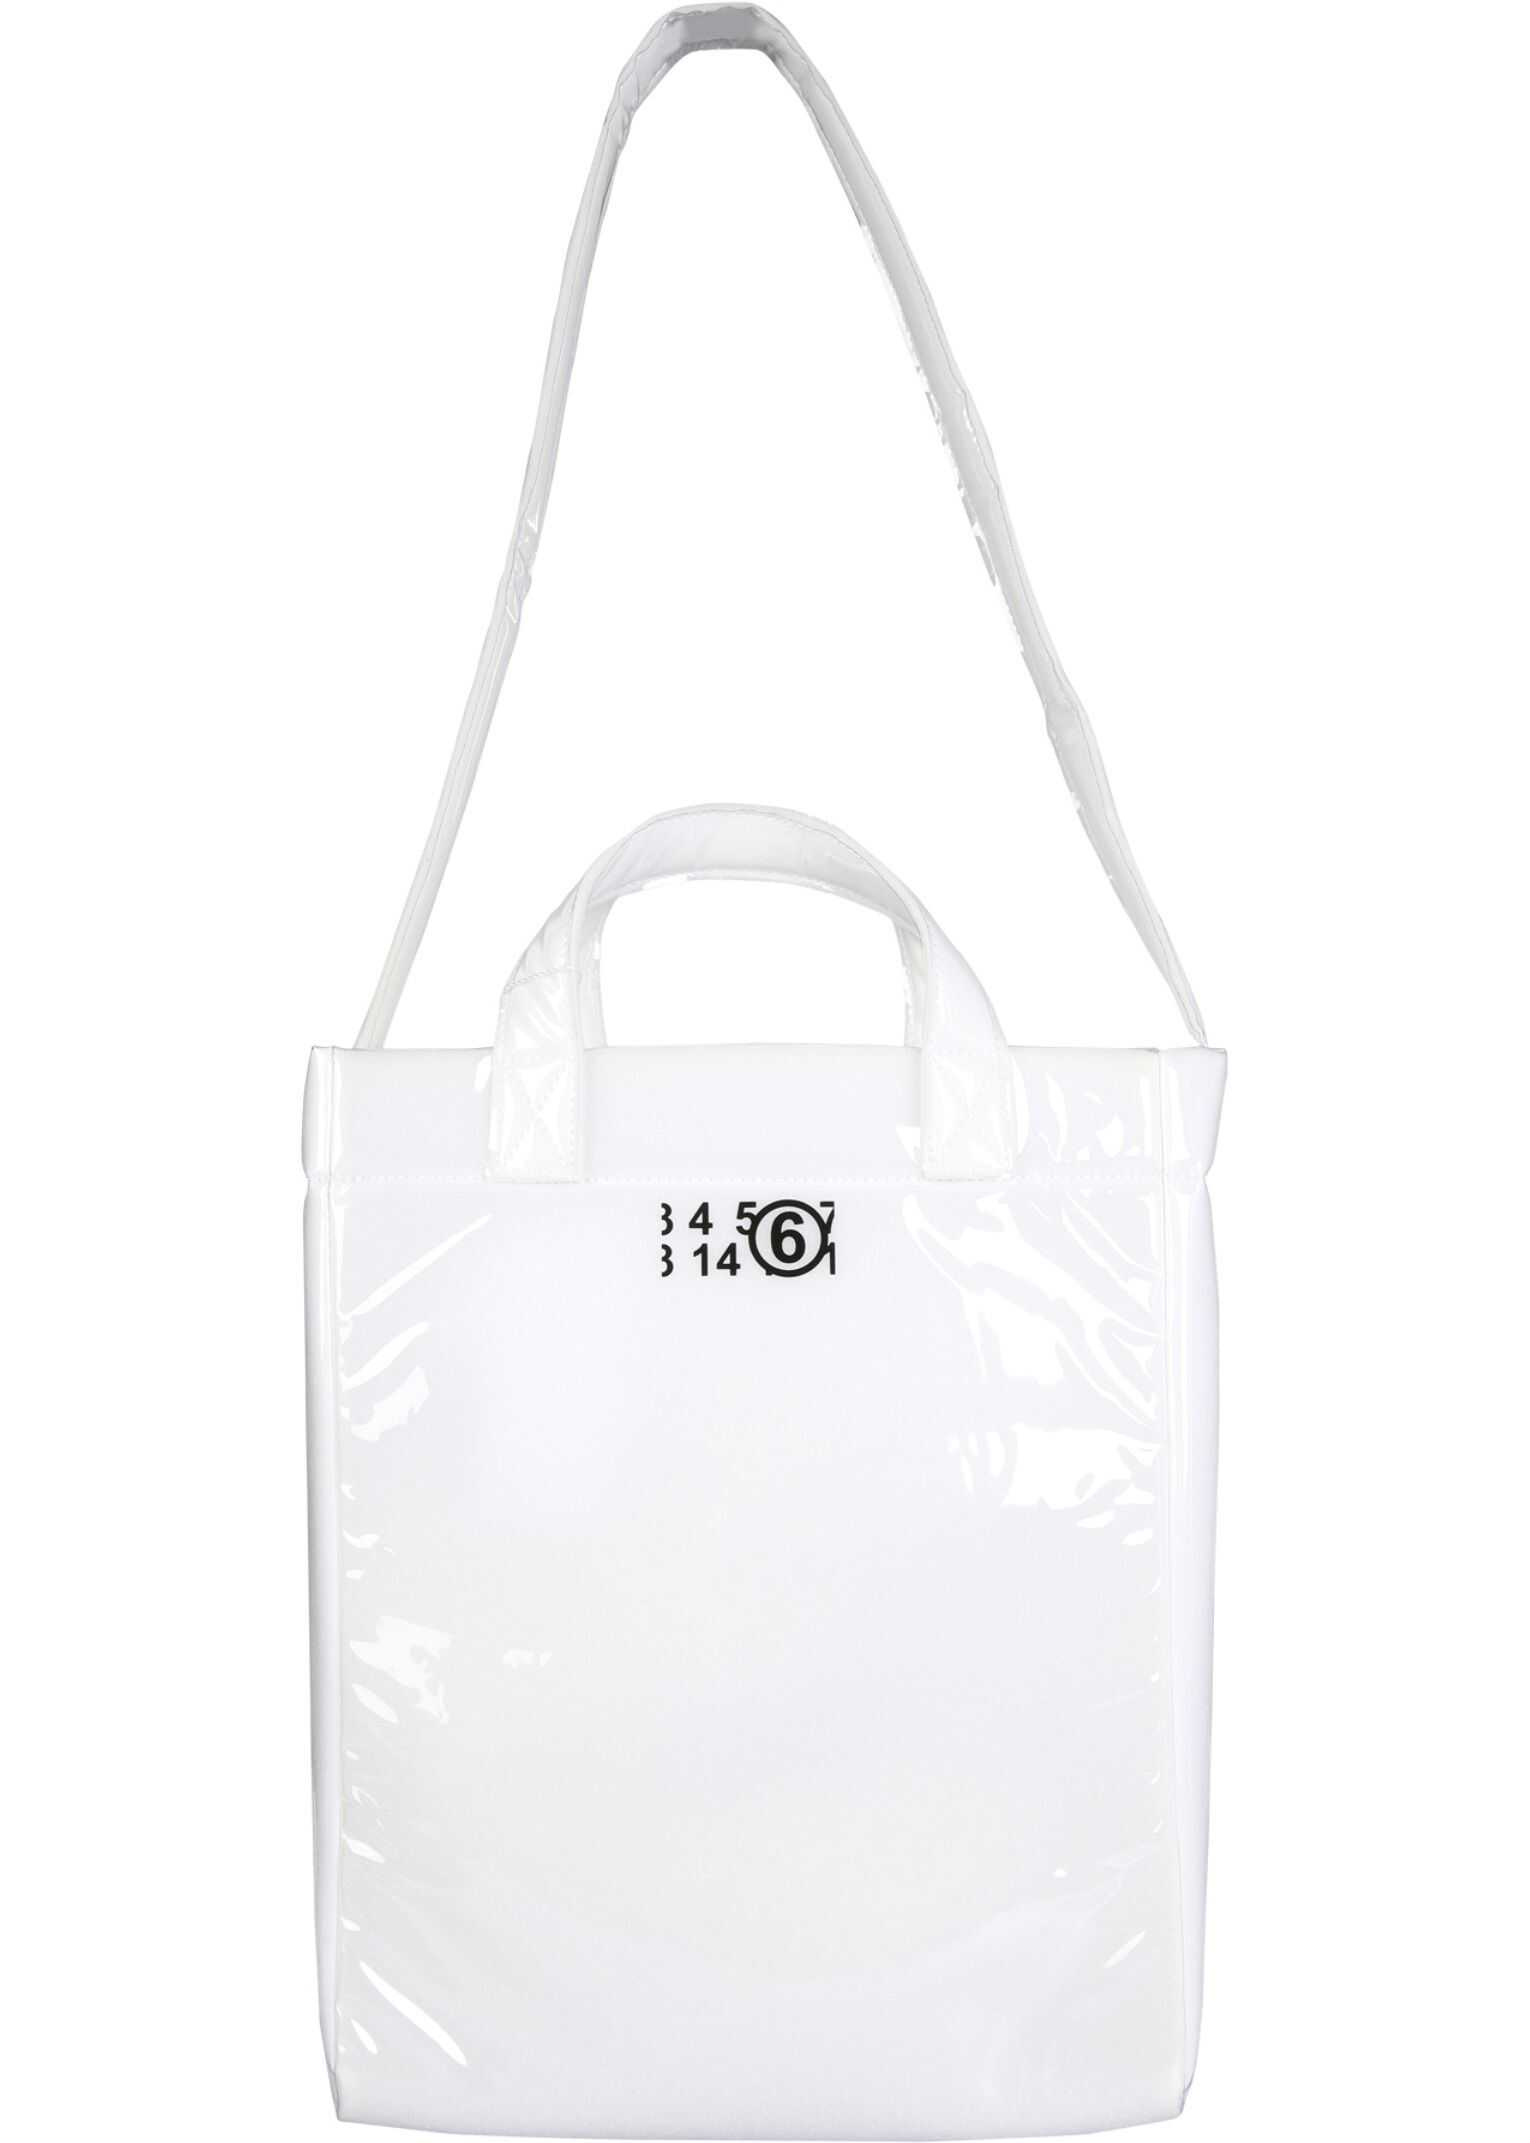 MM6 Maison Margiela Tote Bag With Logo S54WD0100_P2709H8481 WHITE imagine b-mall.ro